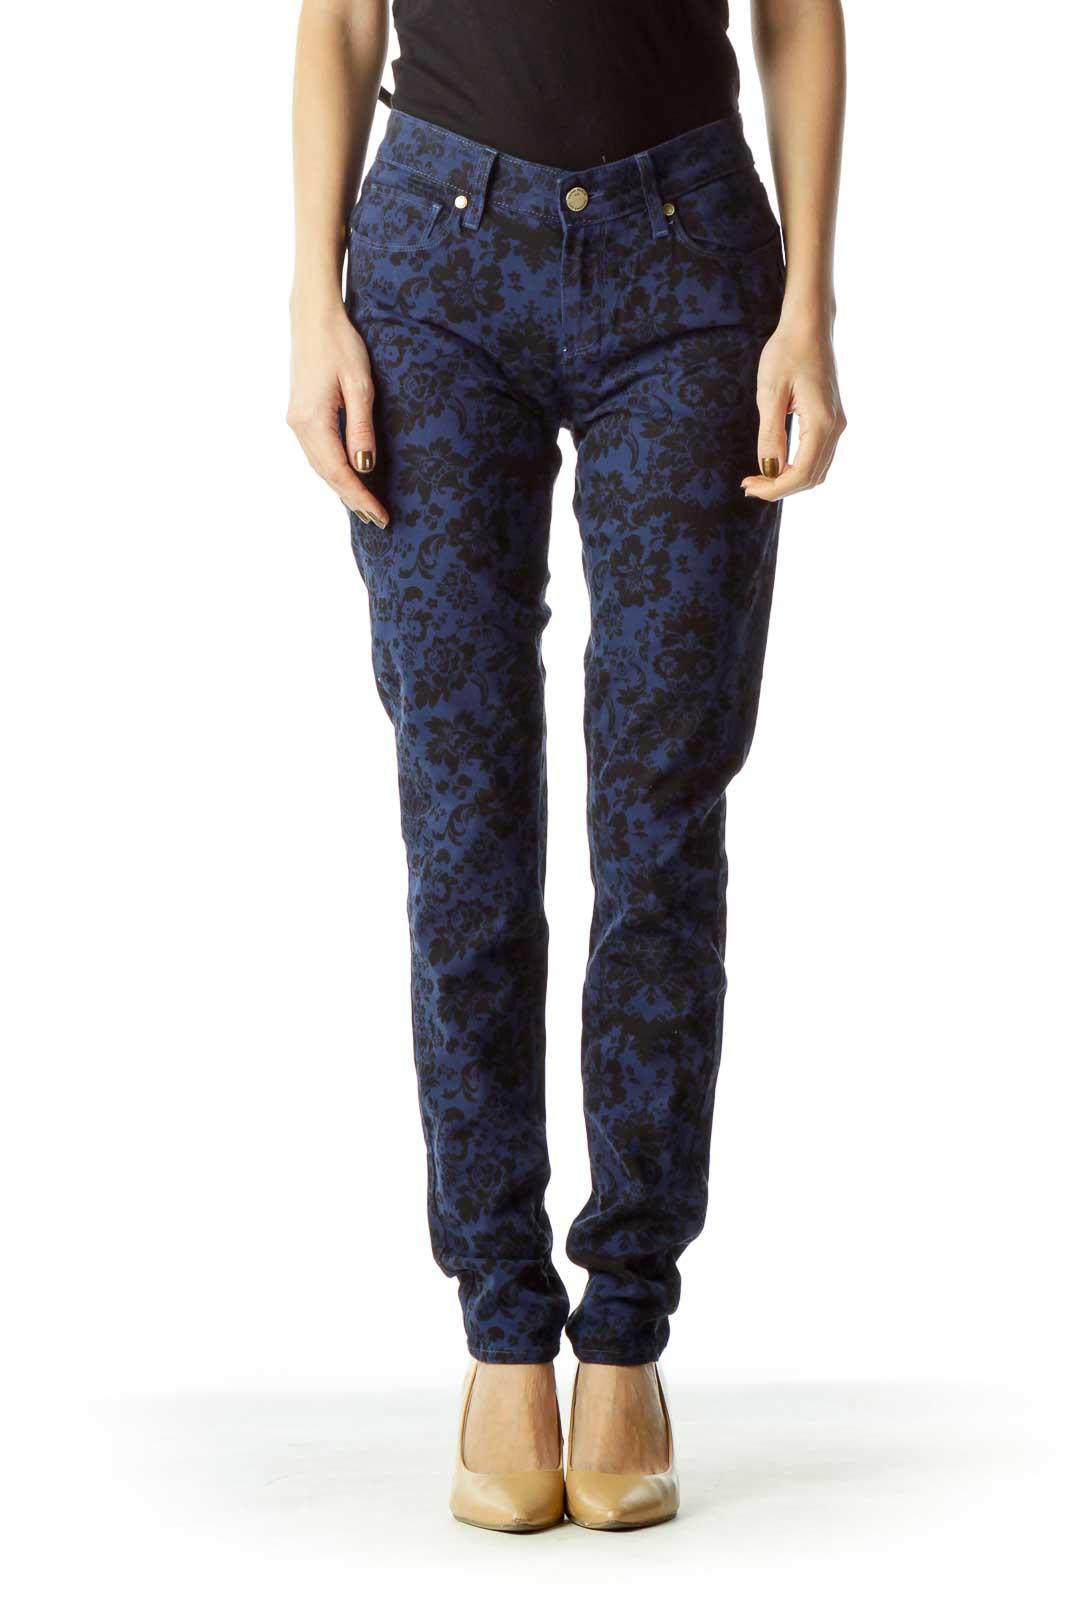 Navy Black Floral Skinny Jeans